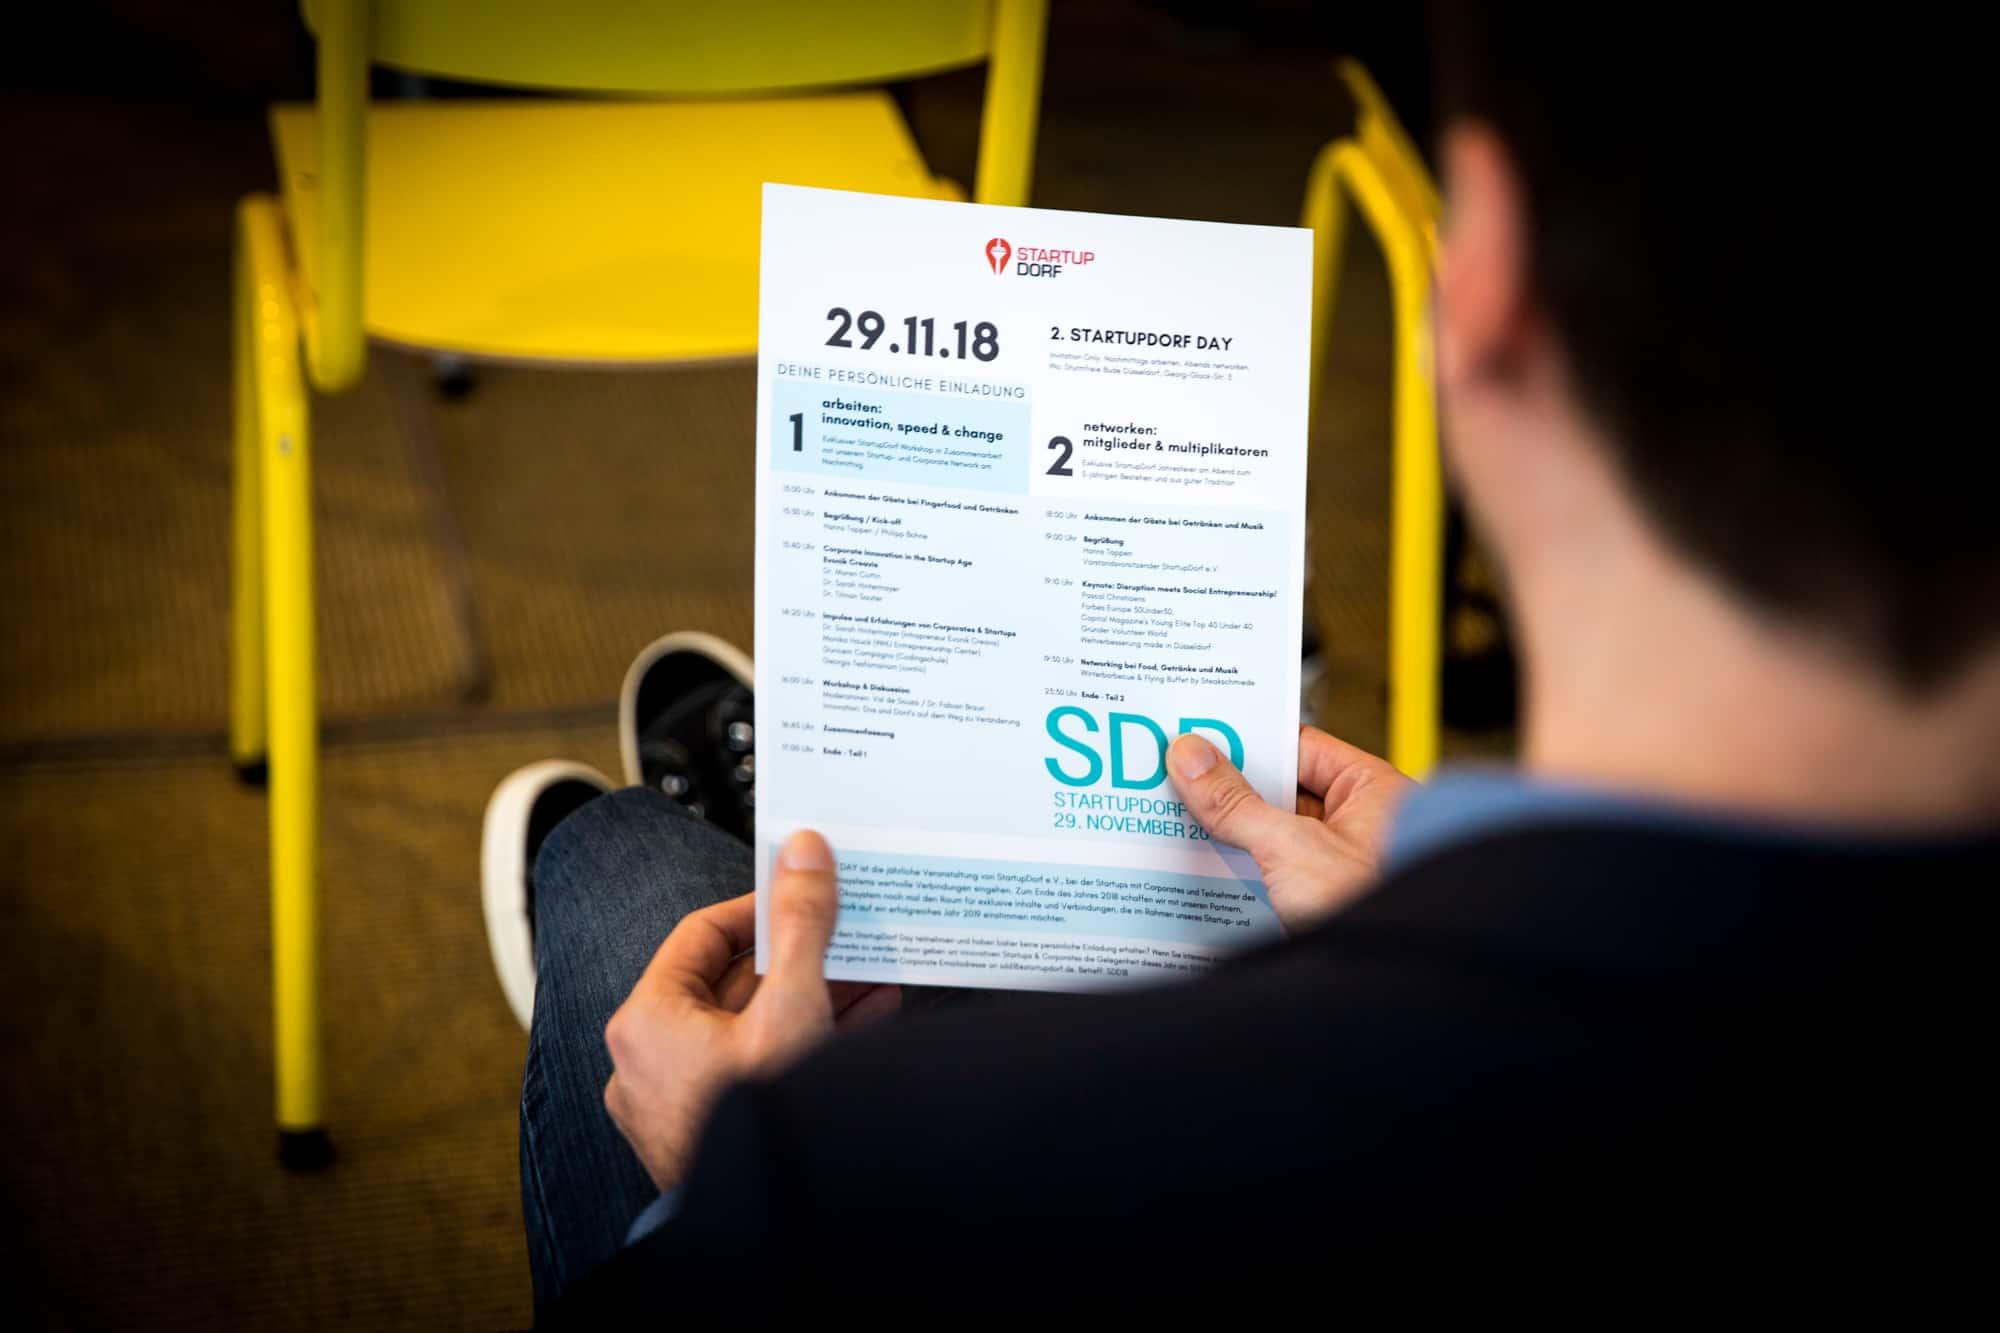 startupdorfday2018_002